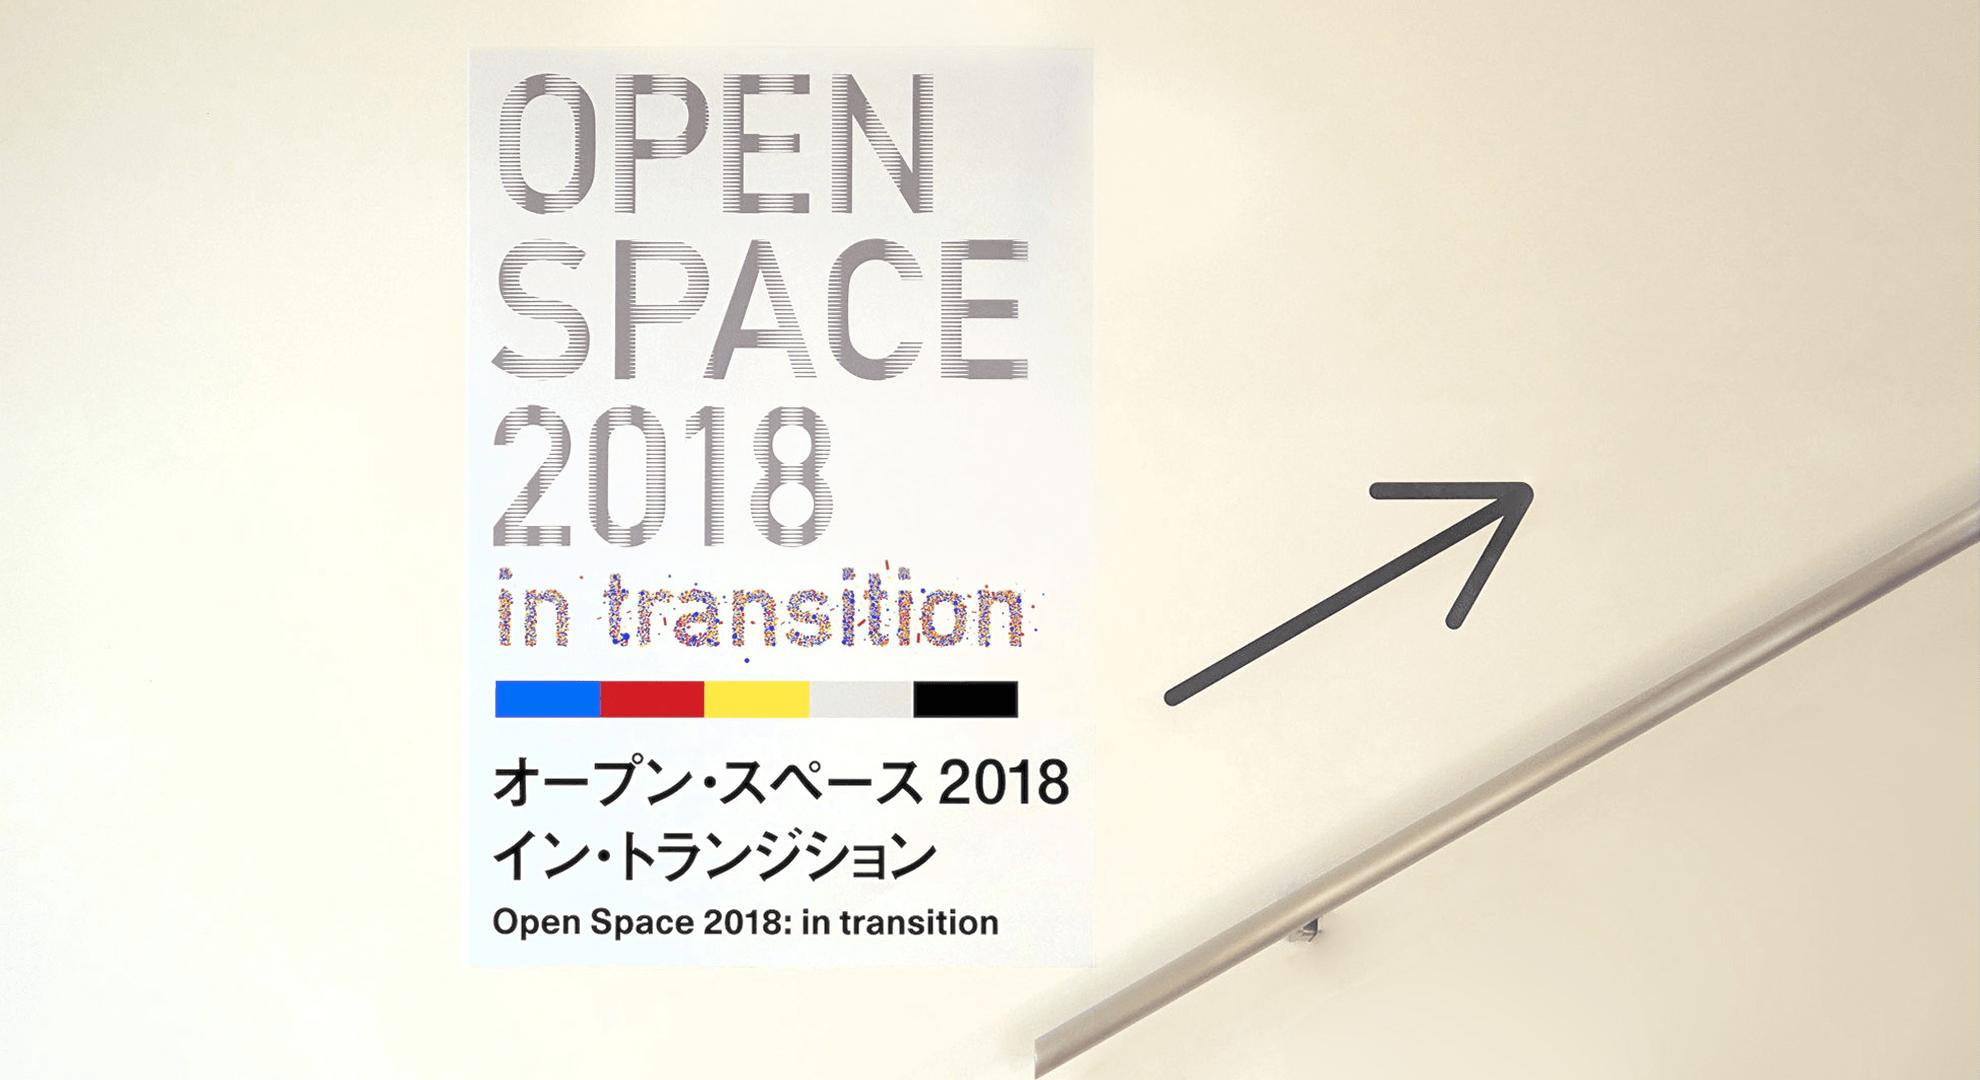 OS2018-01.jpg